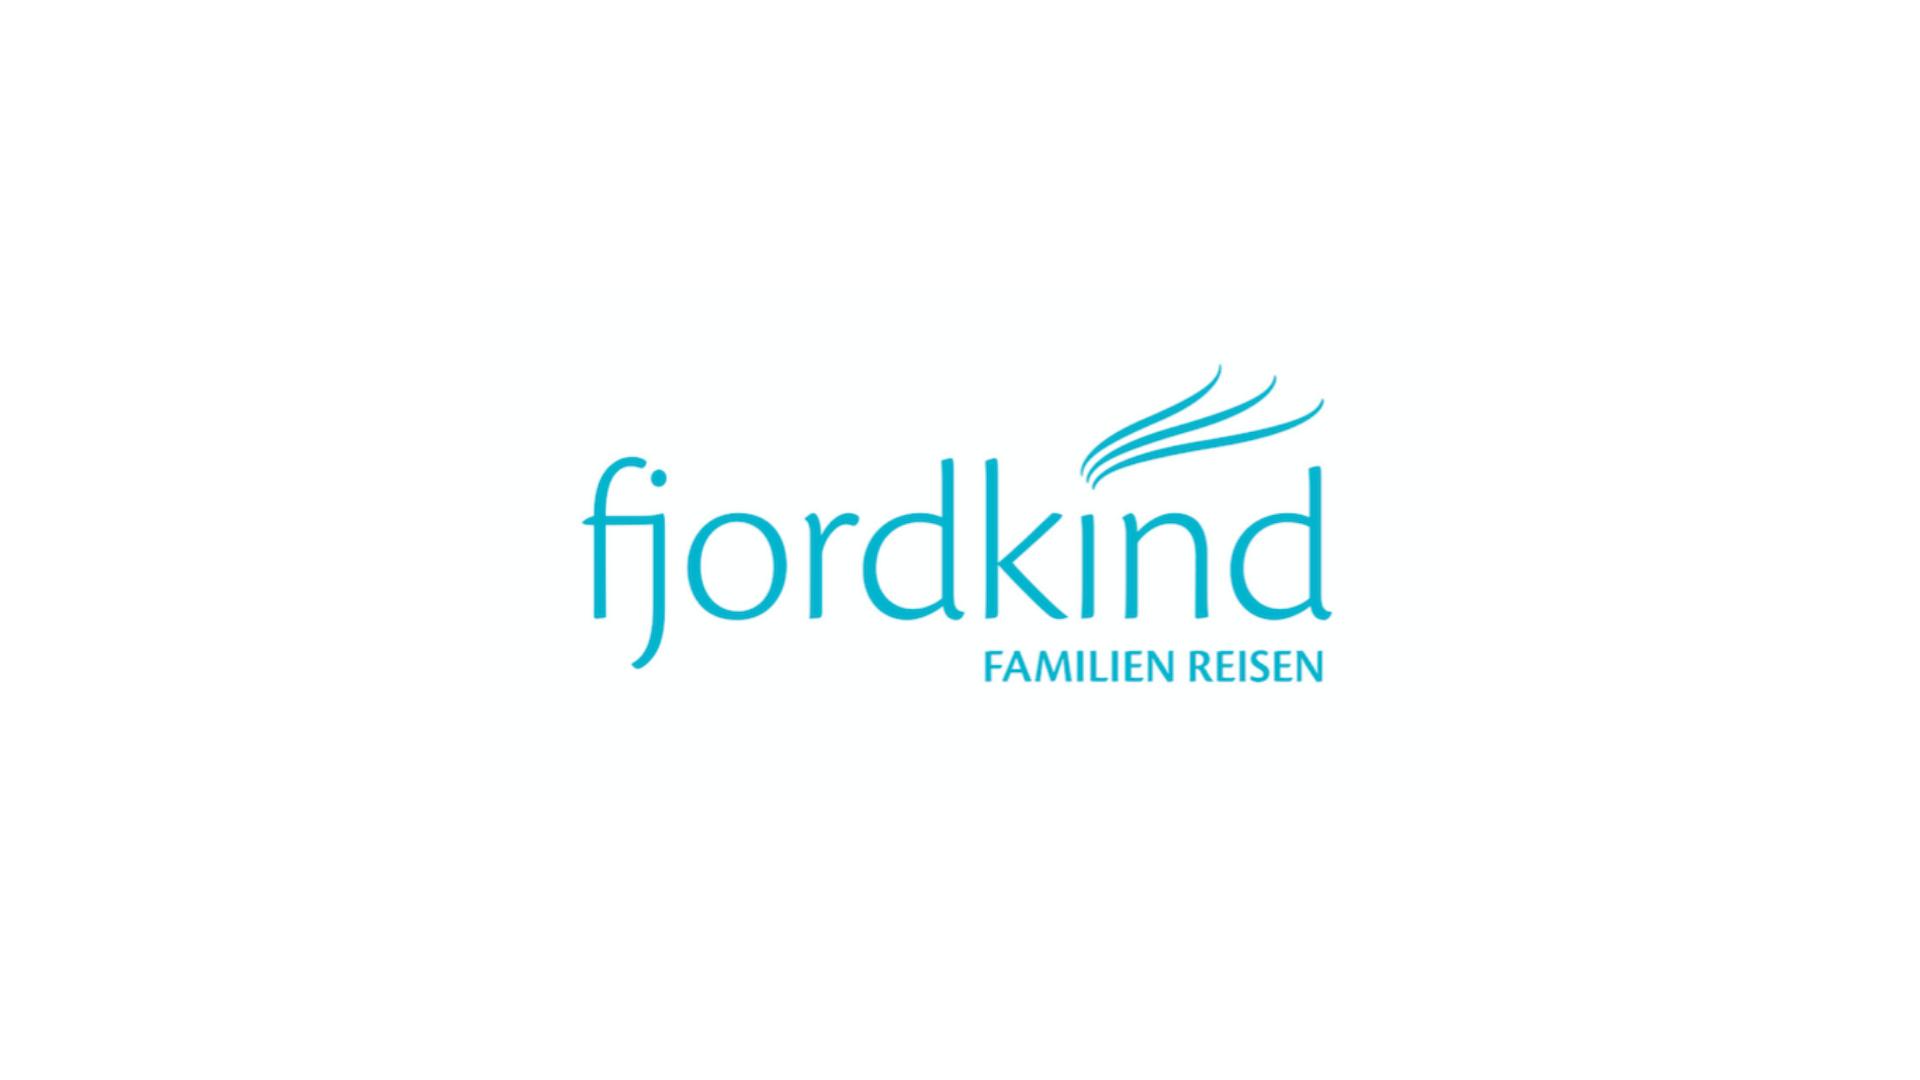 fjordkind-reisen-logo-w